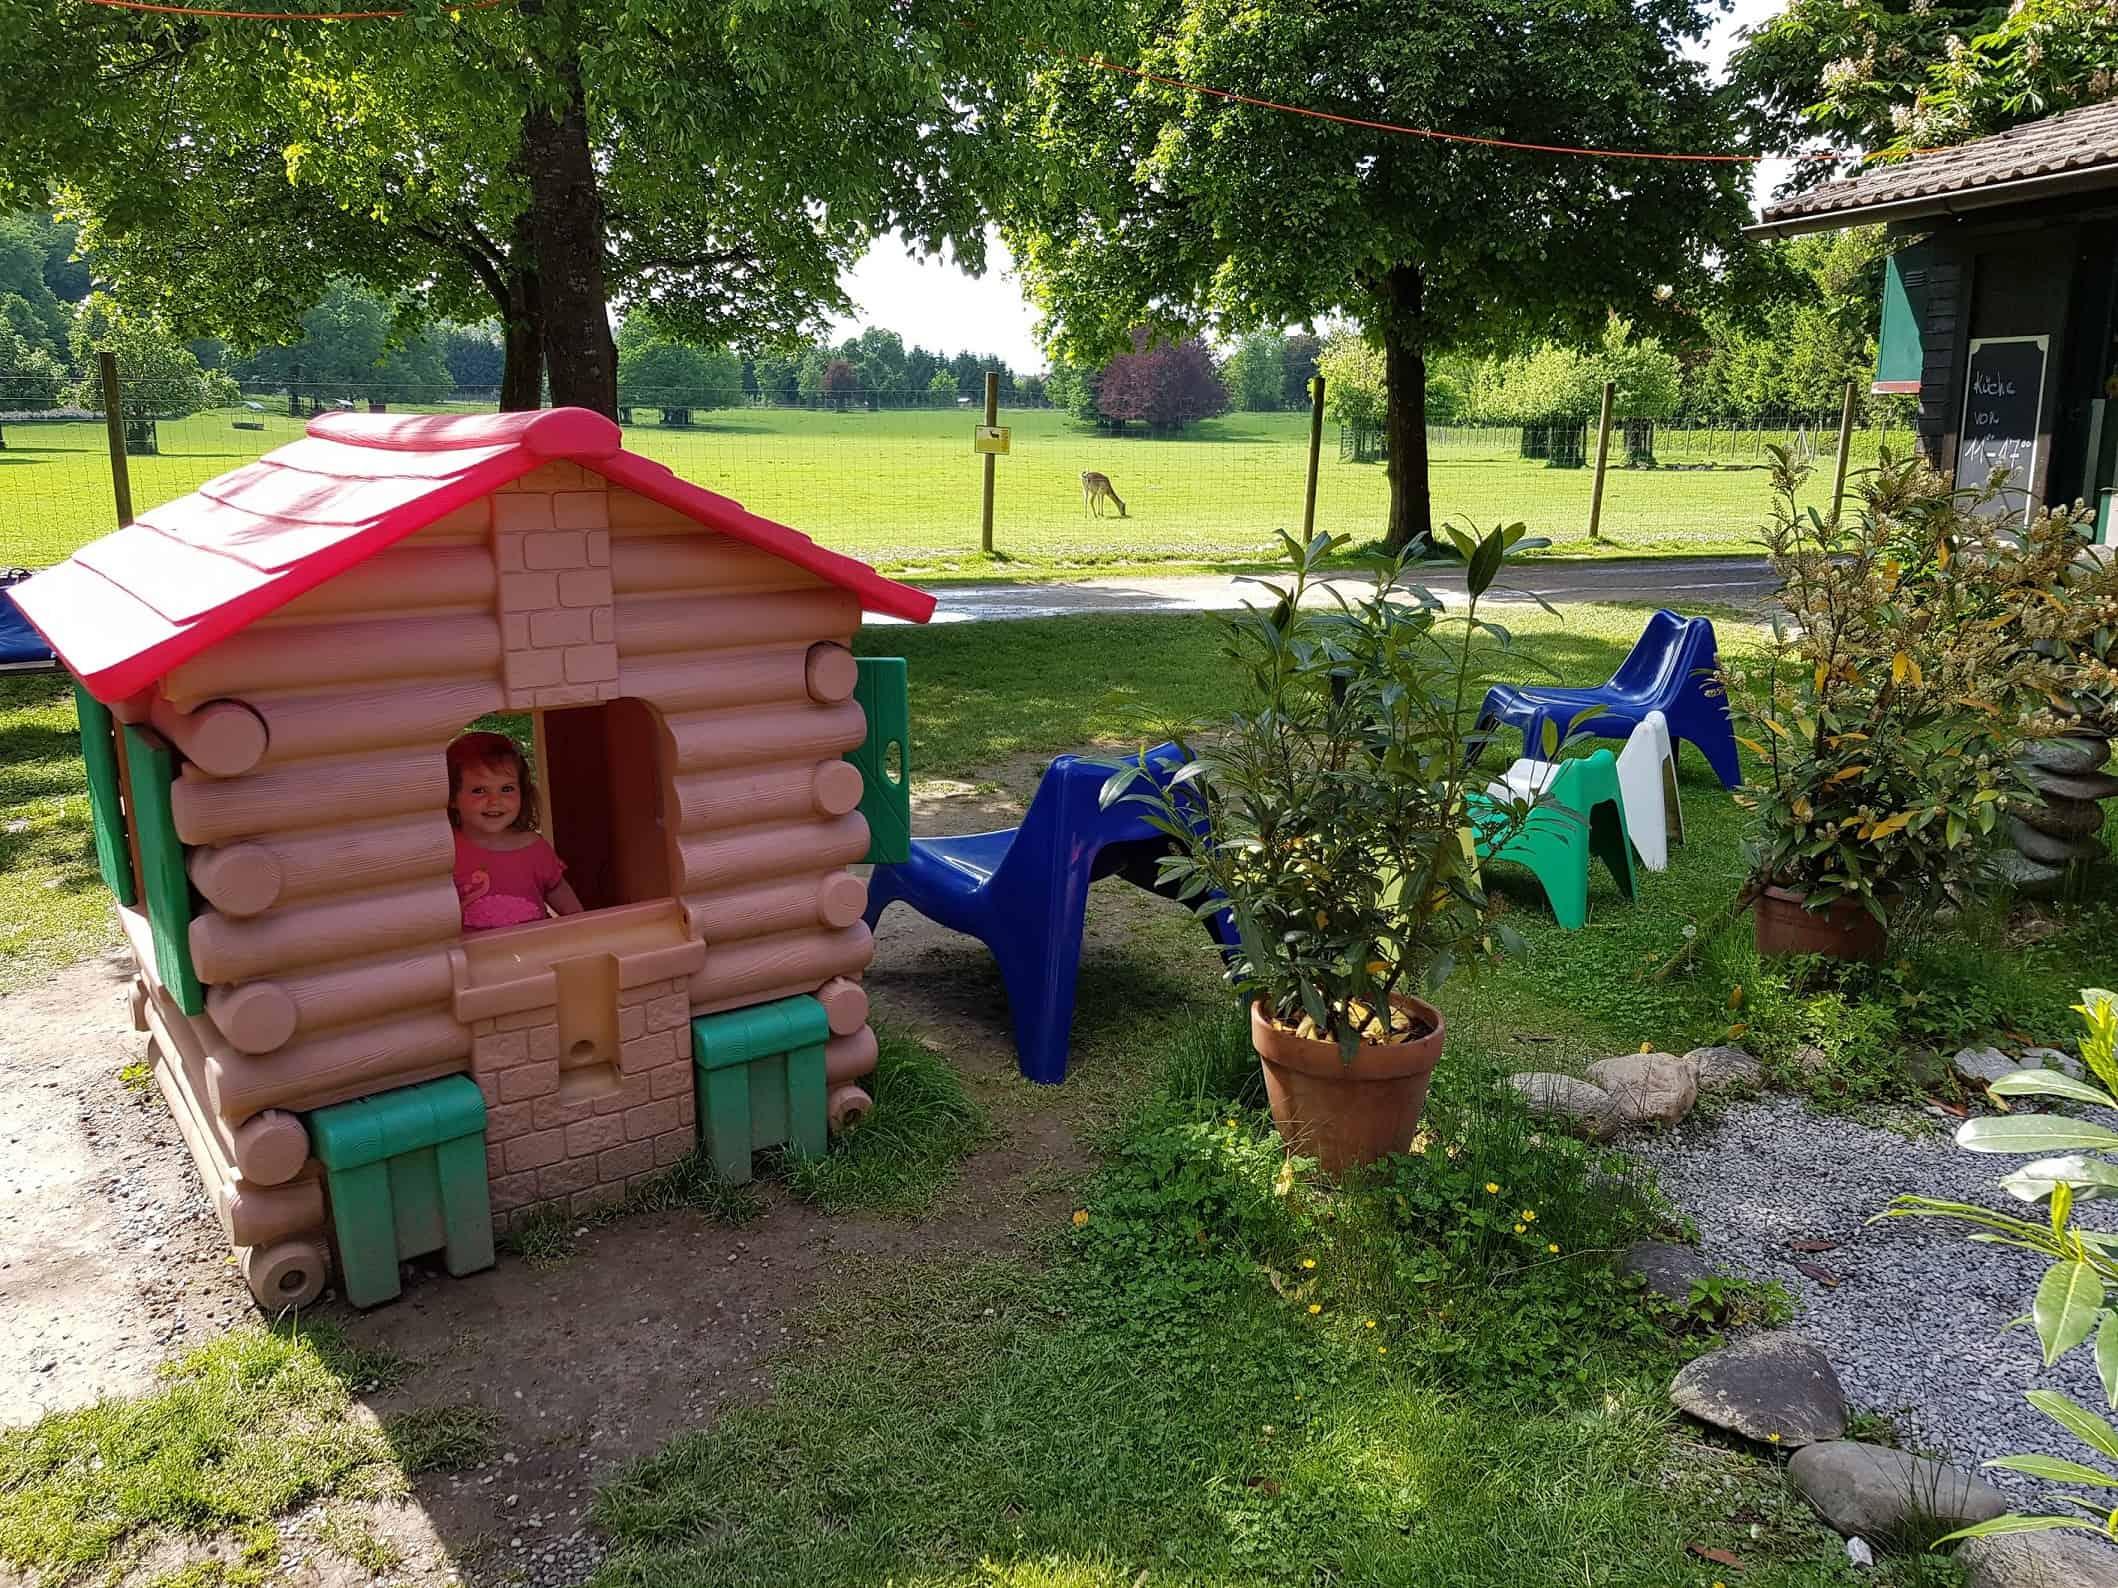 Lieblings Spielplatz Tierpark Rosegg Kärnten Kind im Spielhaus